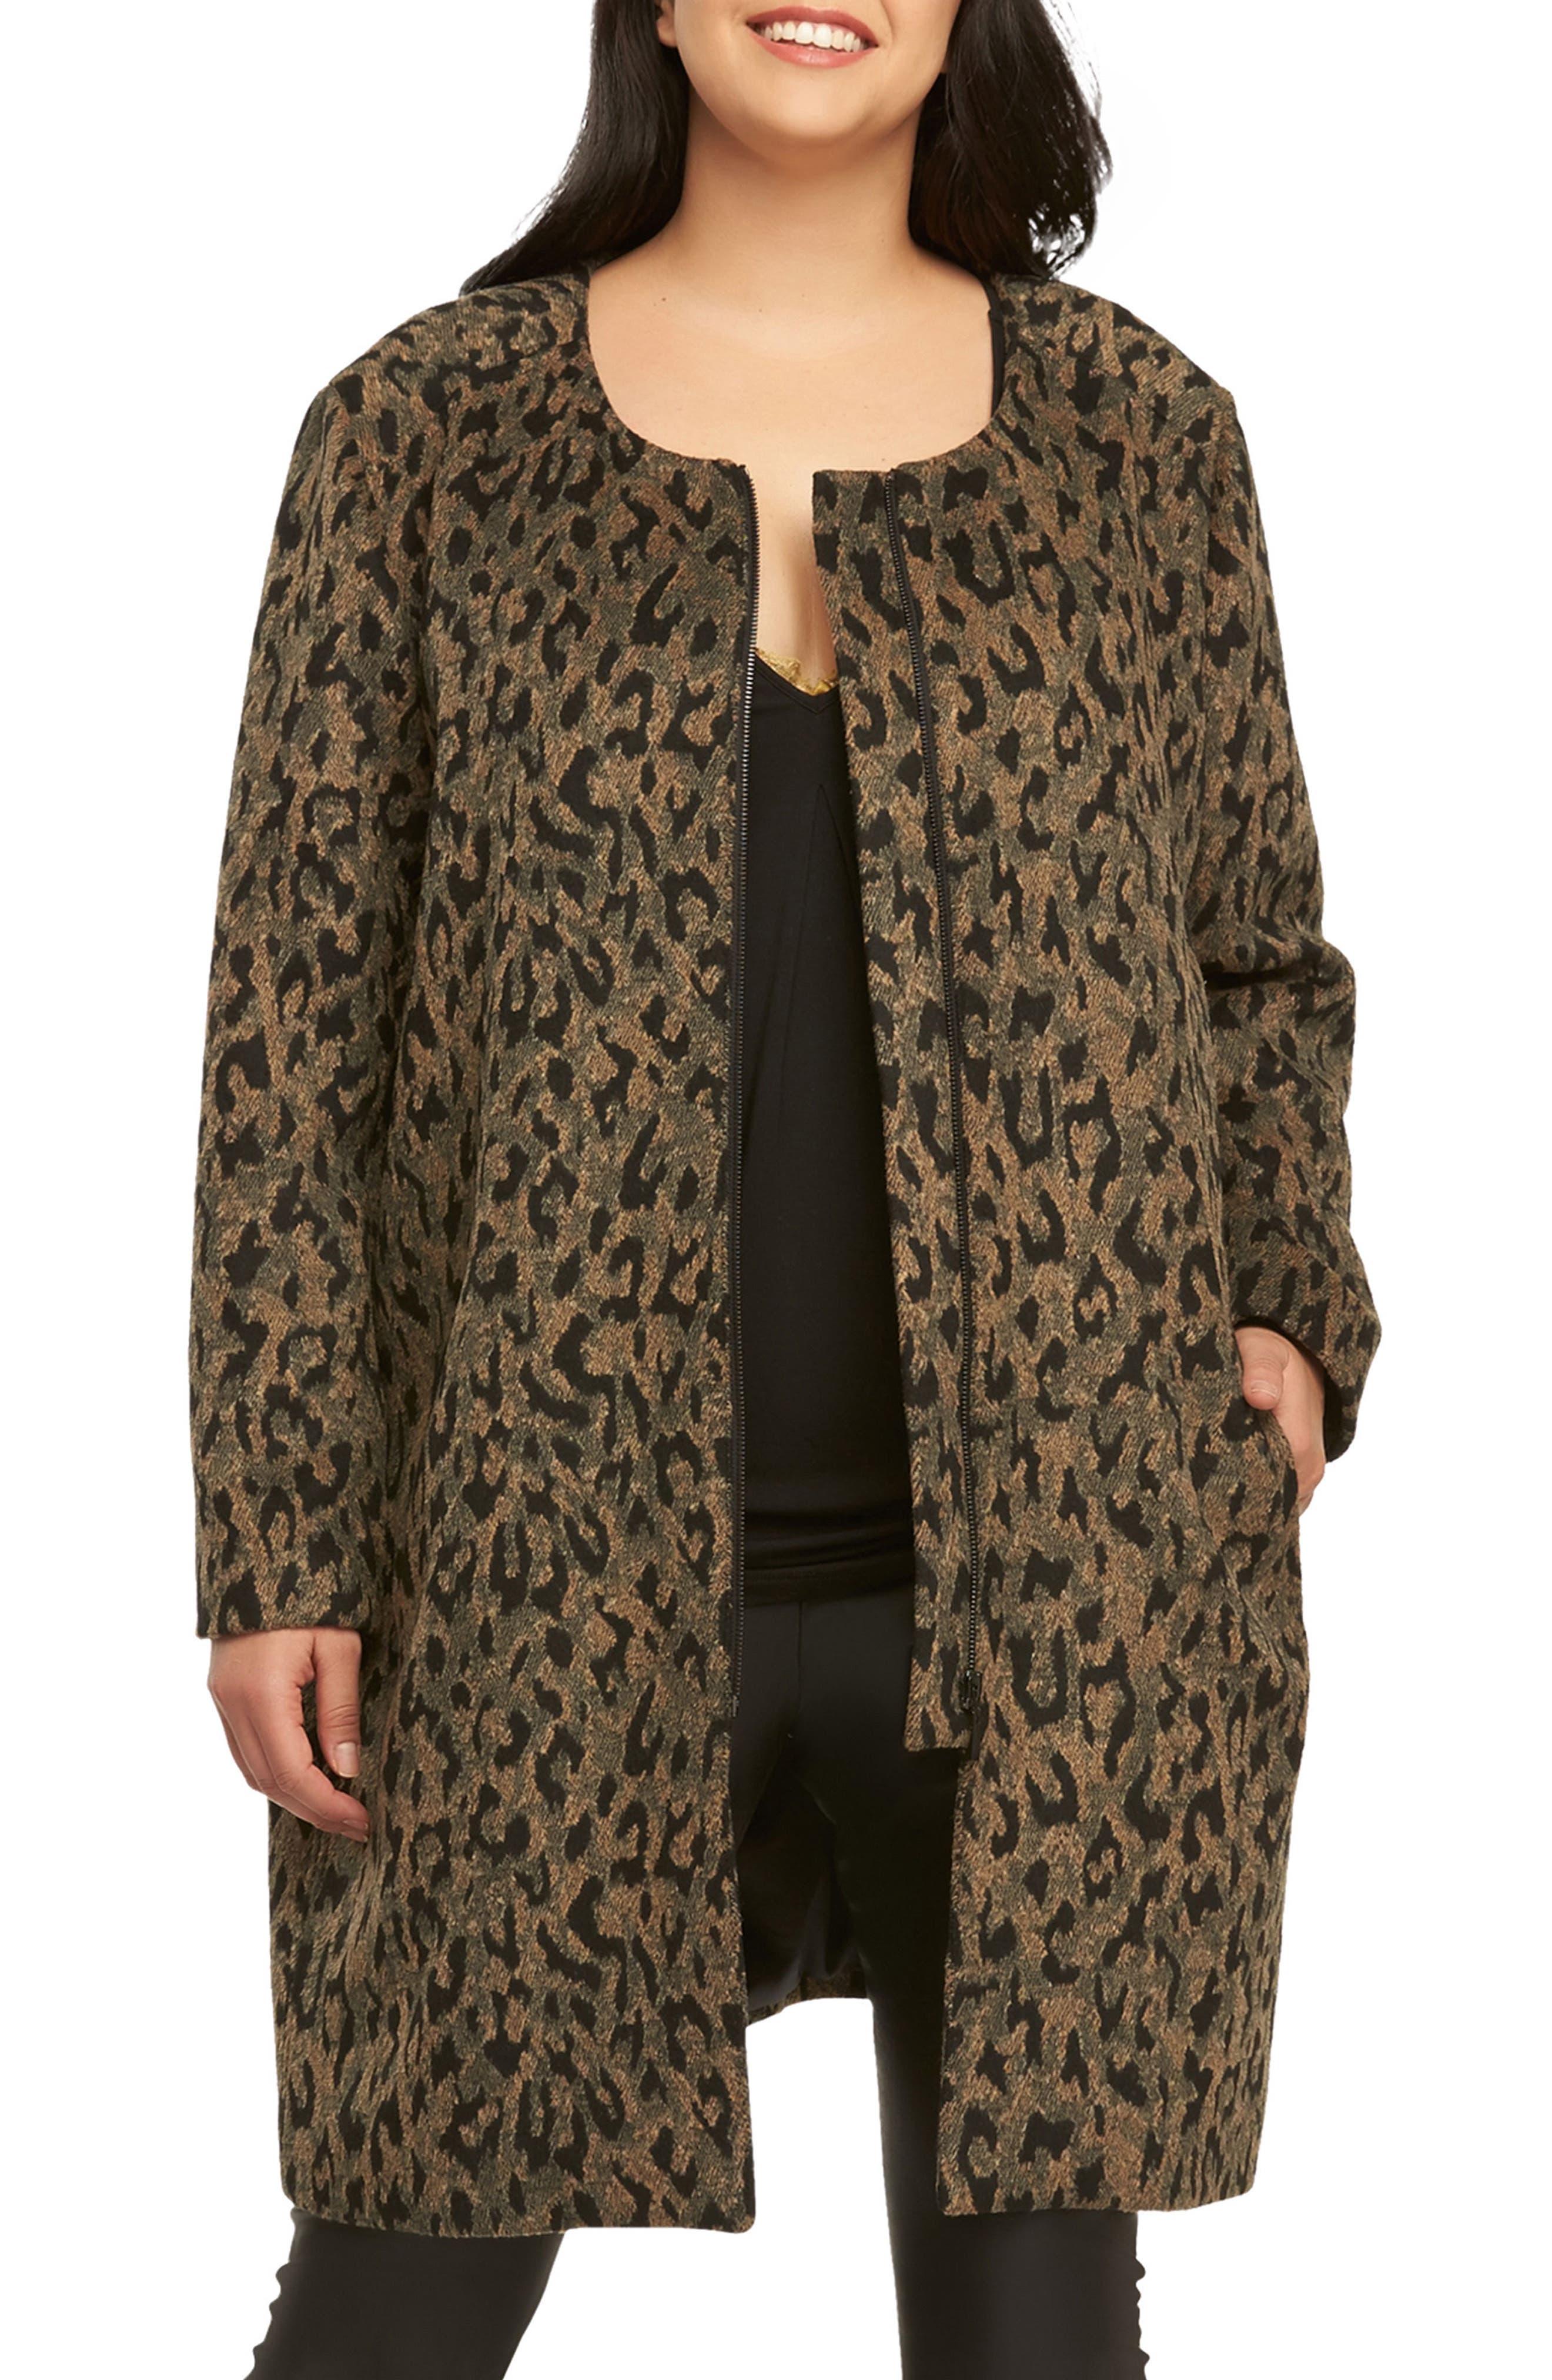 Ashton Leopard Print Coat,                             Main thumbnail 1, color,                             Leopard